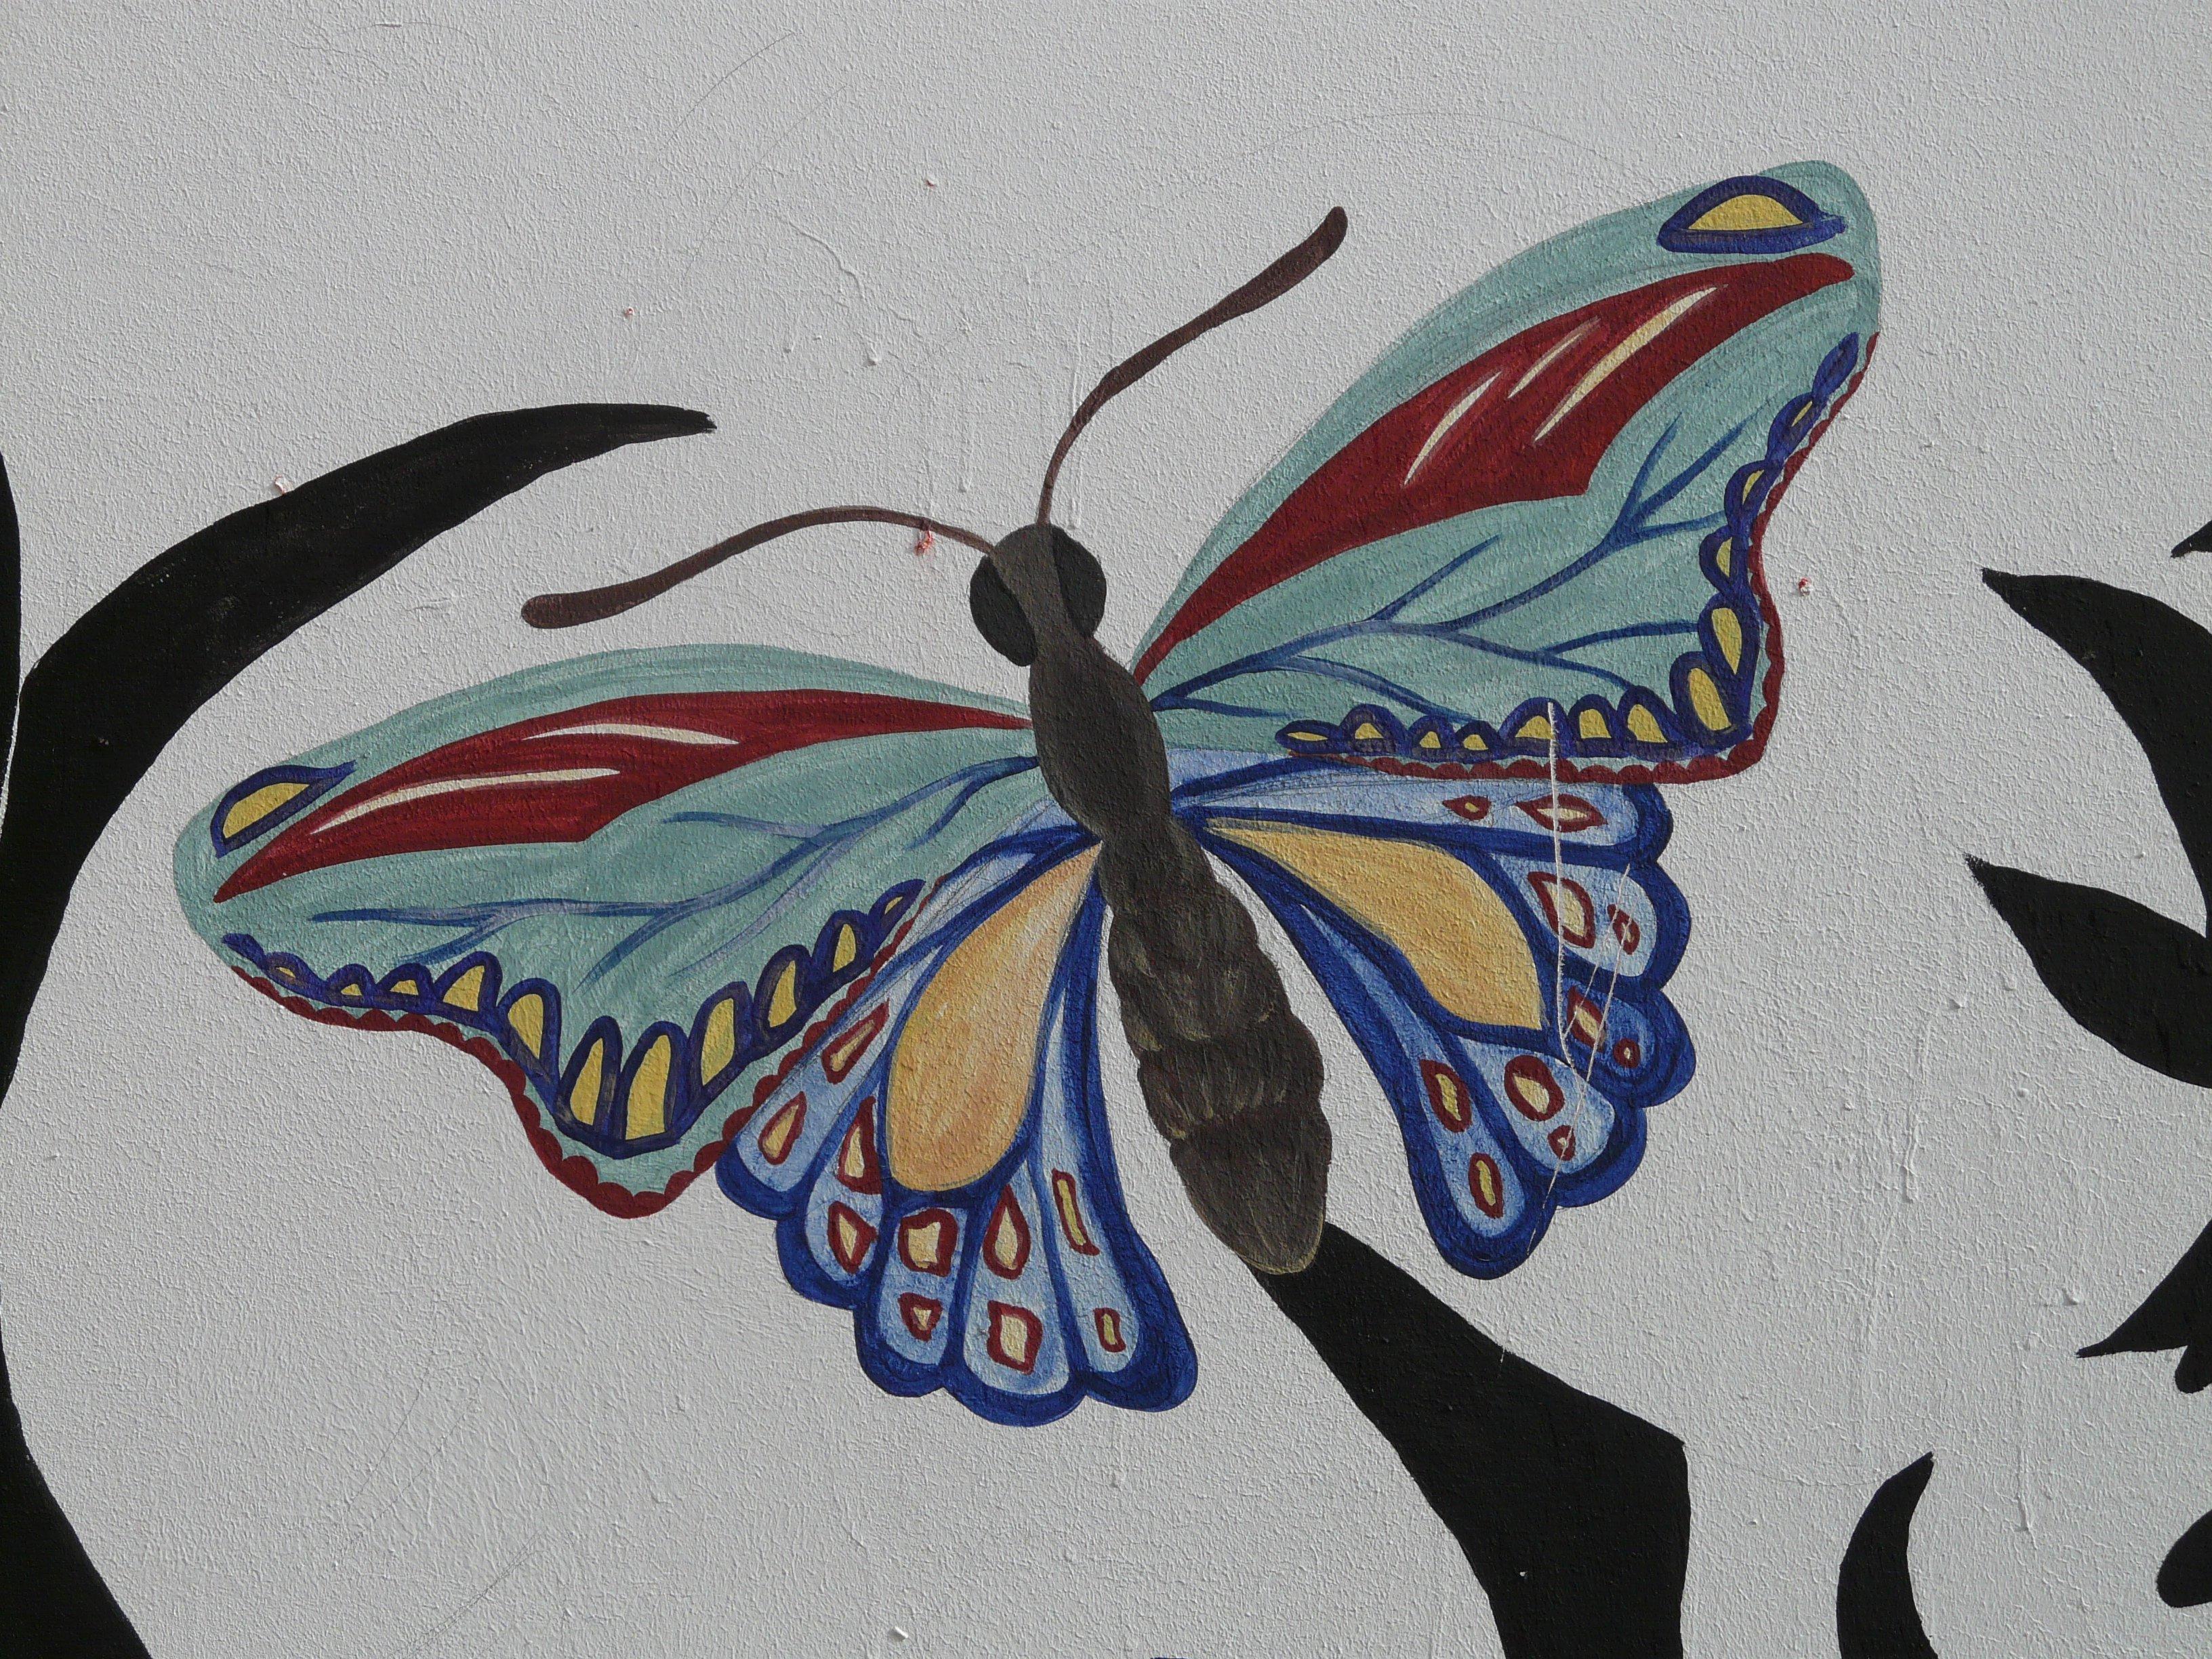 Gambar Sayap Jendela Hewan Serangga Biru Invertebrata Seni